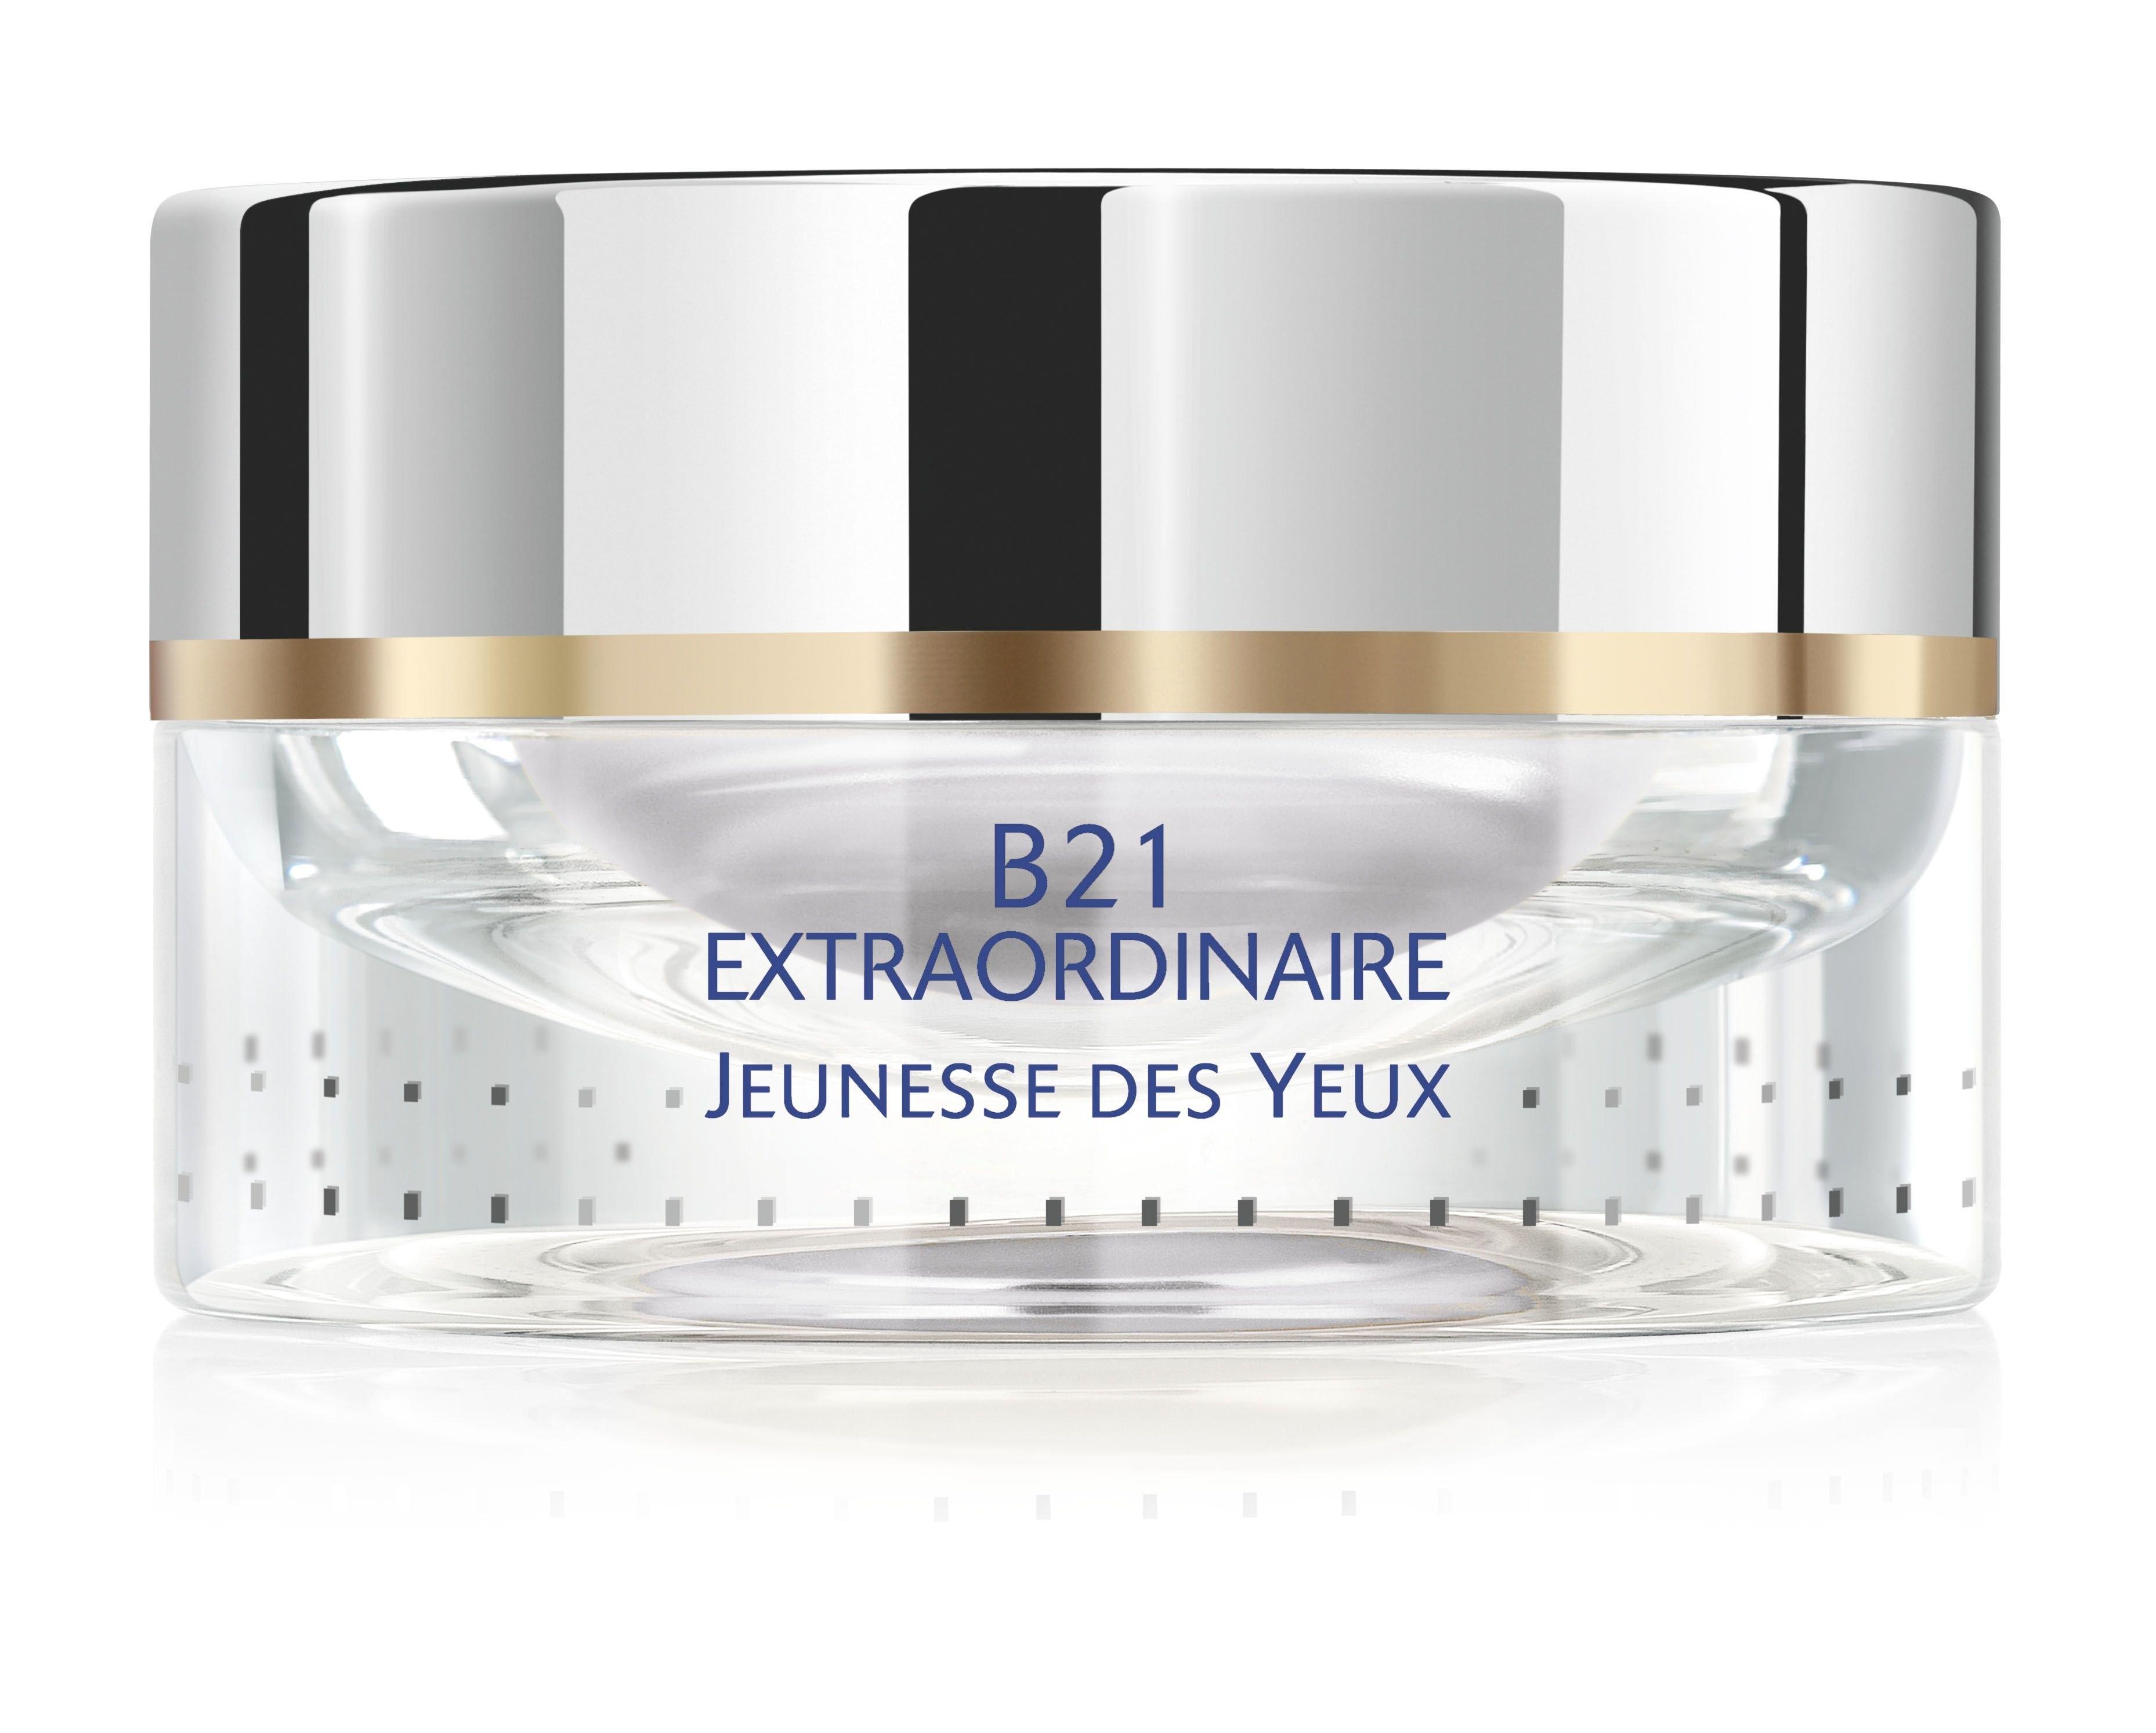 Crema Contorno de Ojos Orlane B21 Extraordinaire Yeux 15 Ml